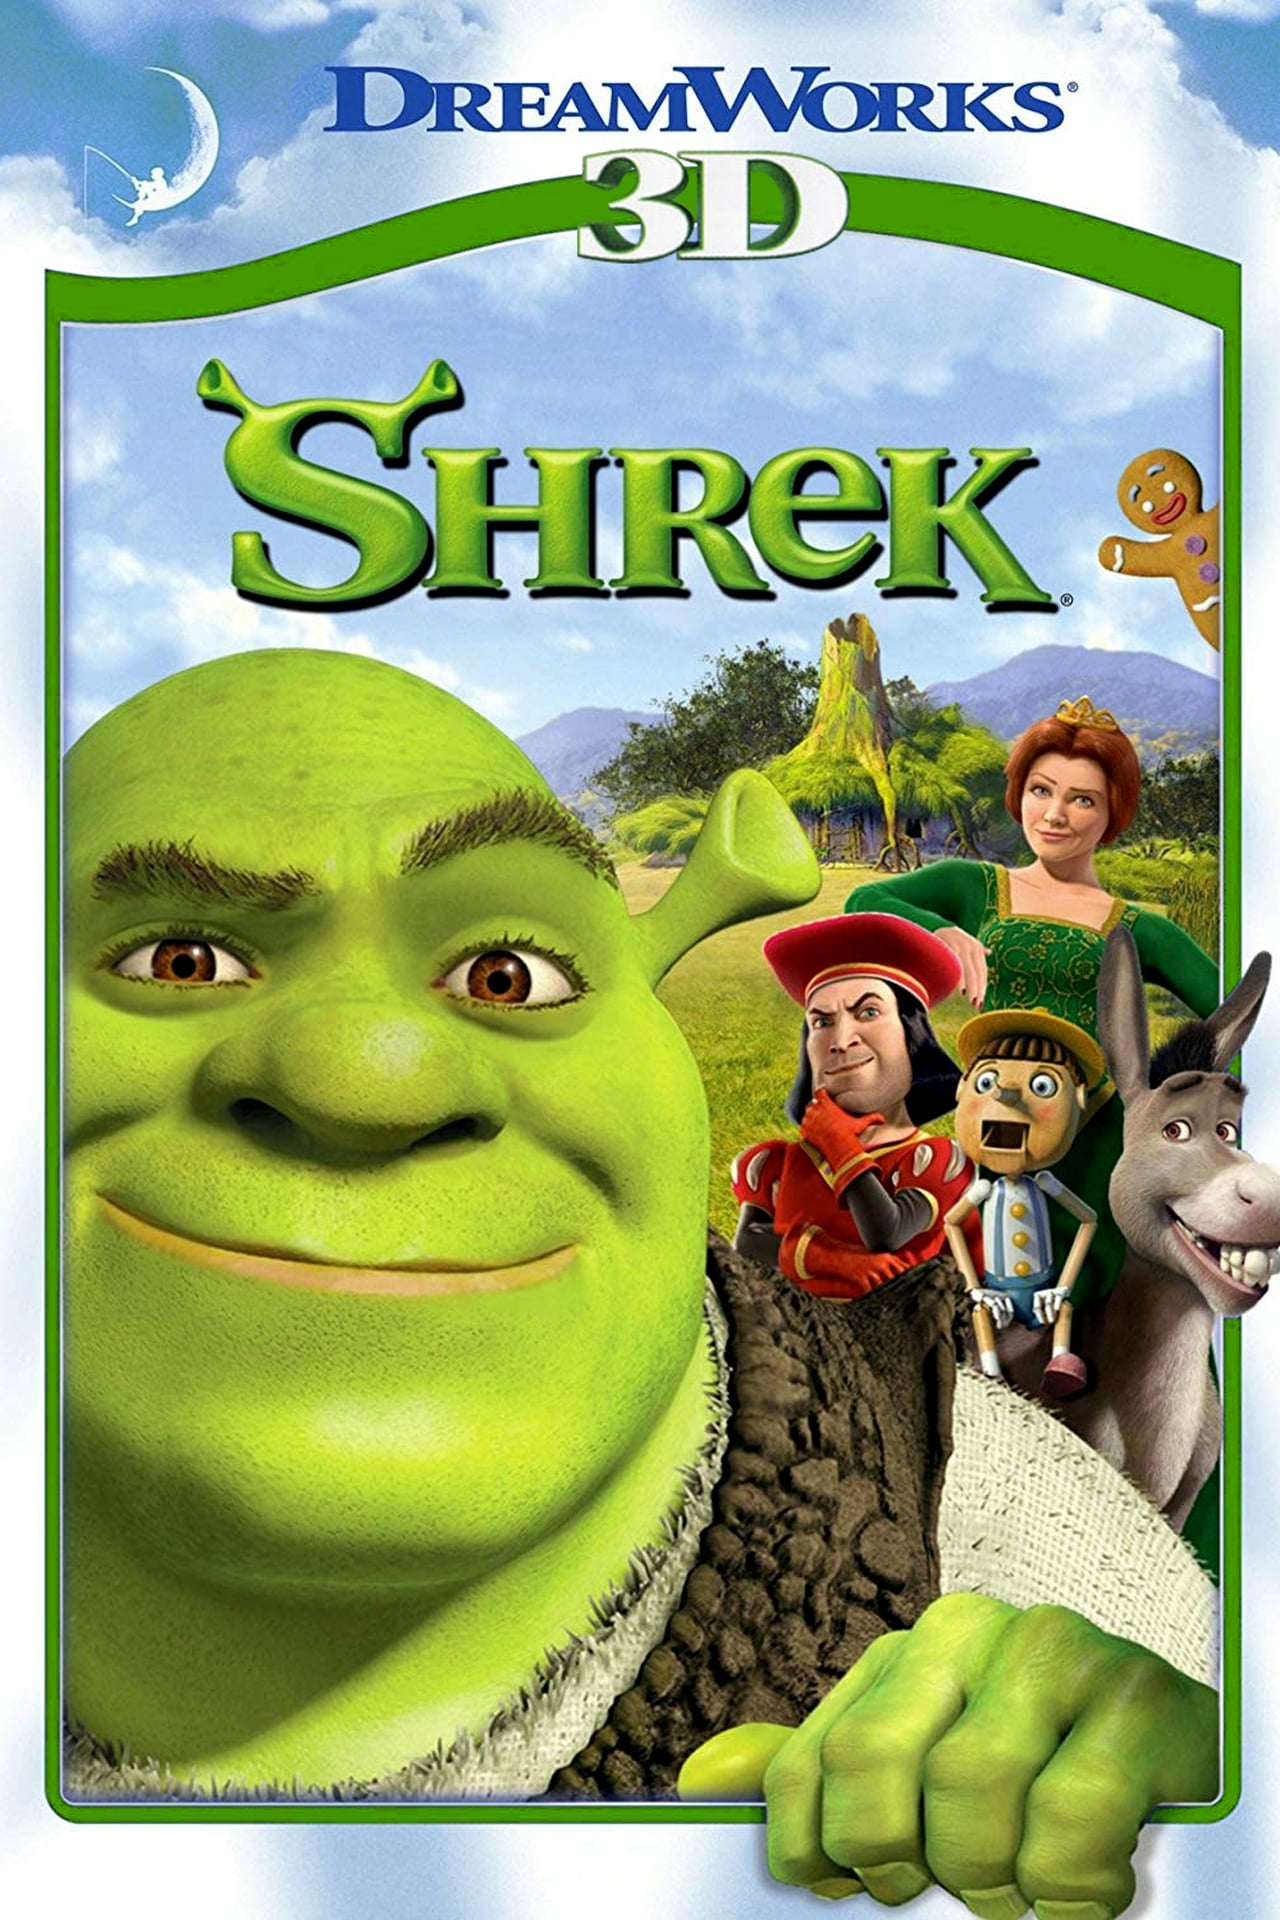 Watch Free Shrek (2001) Movie Online at get.playnowstore.com